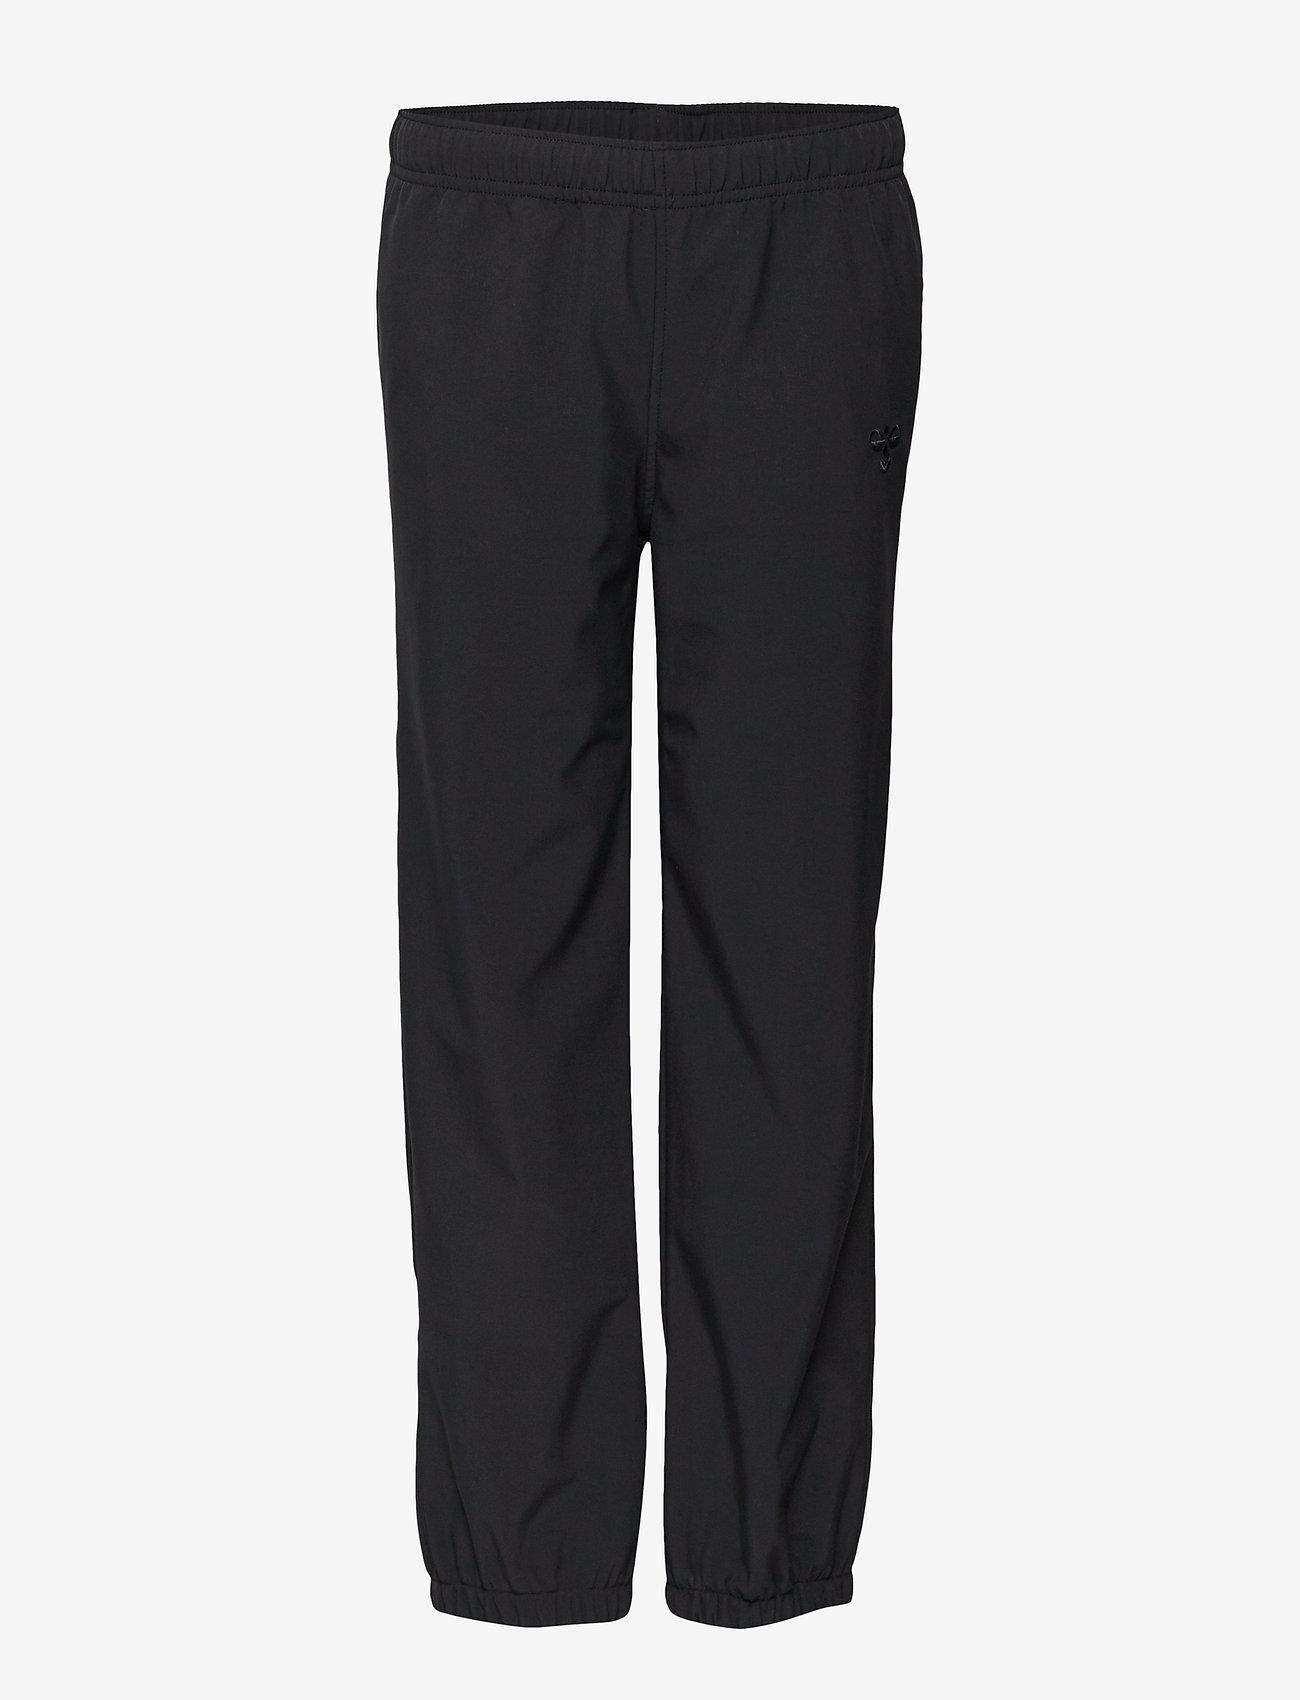 Hummel - HMLRENE PANTS - softshell pants - black - 0